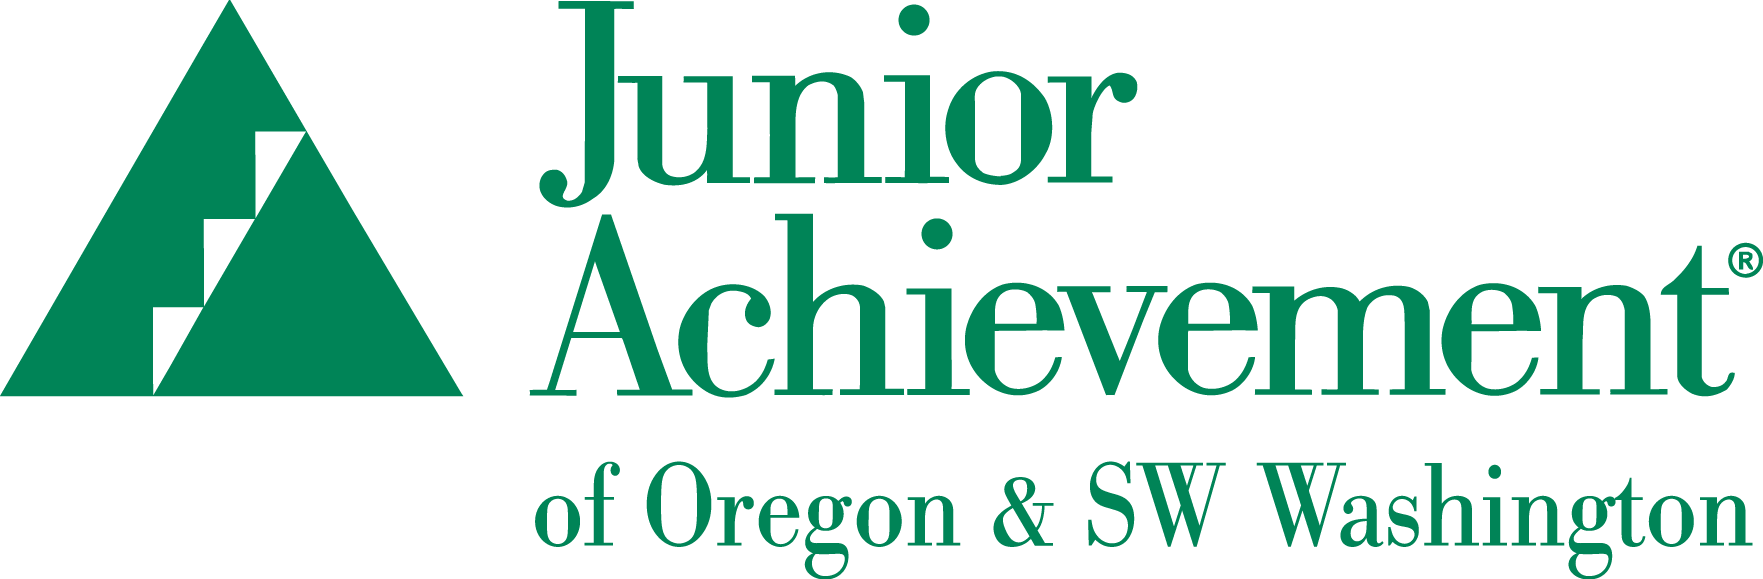 JA-of-Oregon-&-SW-Washington-Green (2).png